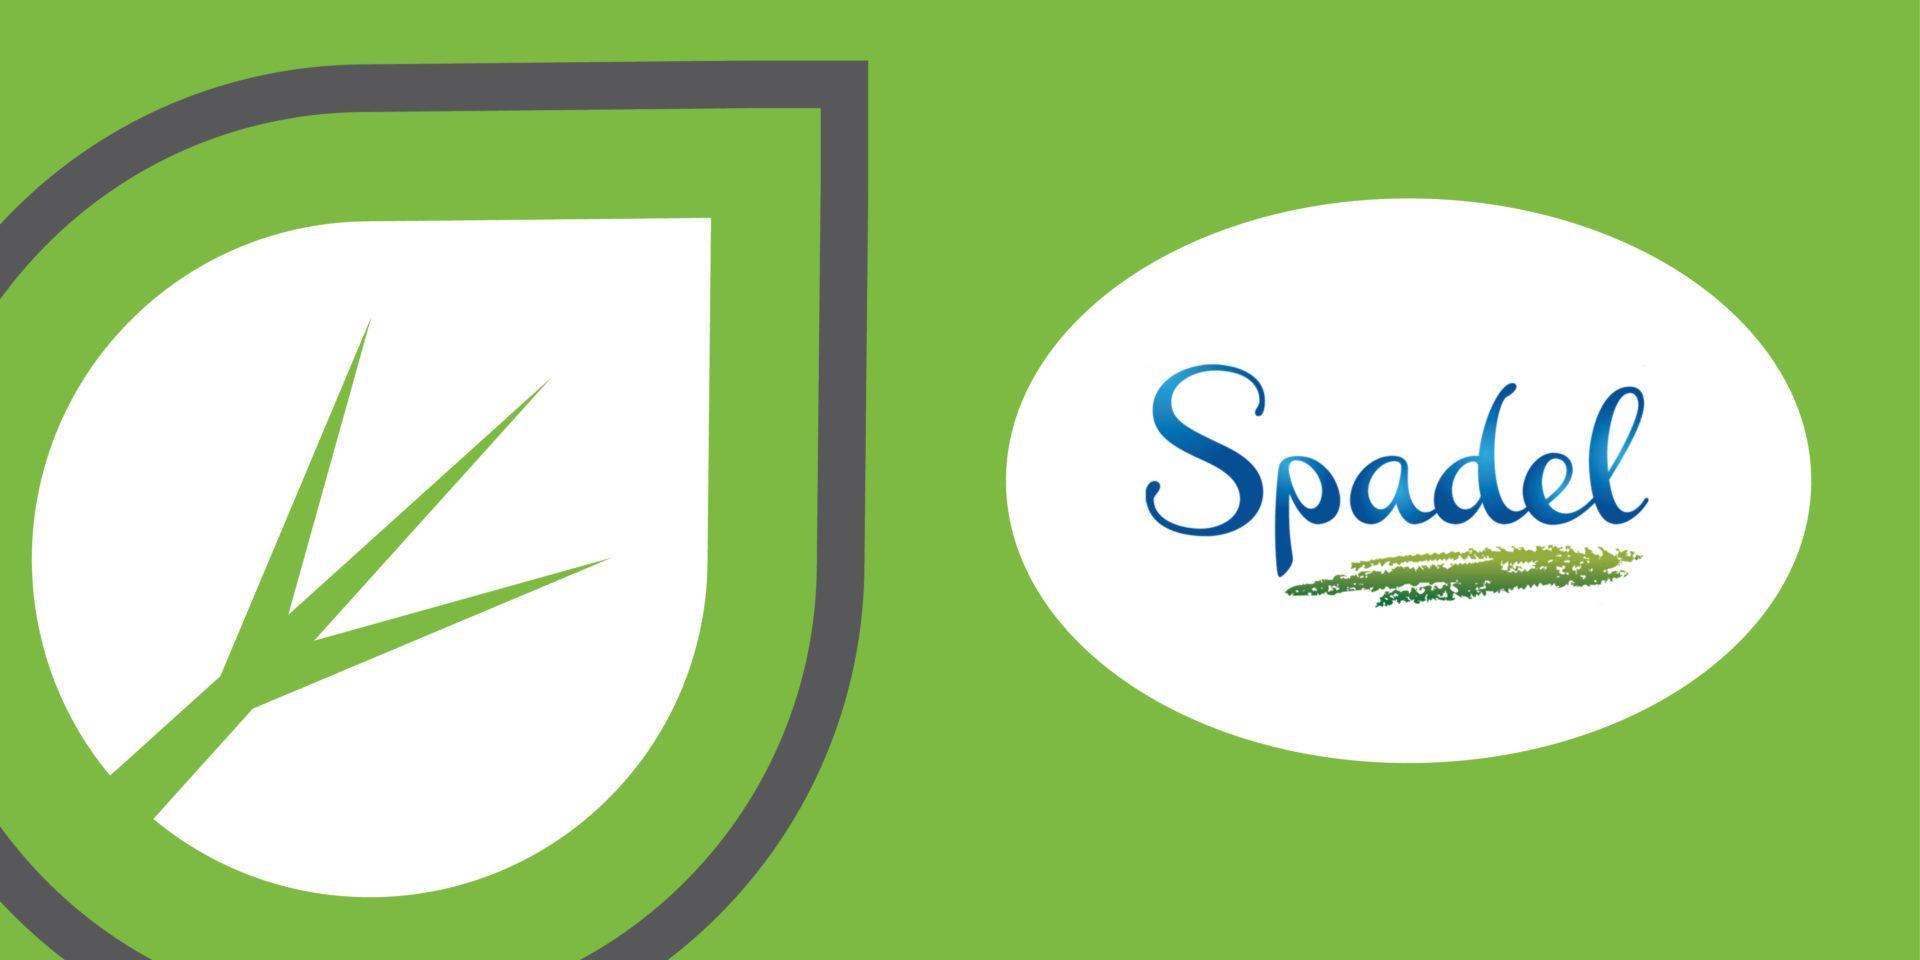 Spadel Customer Case